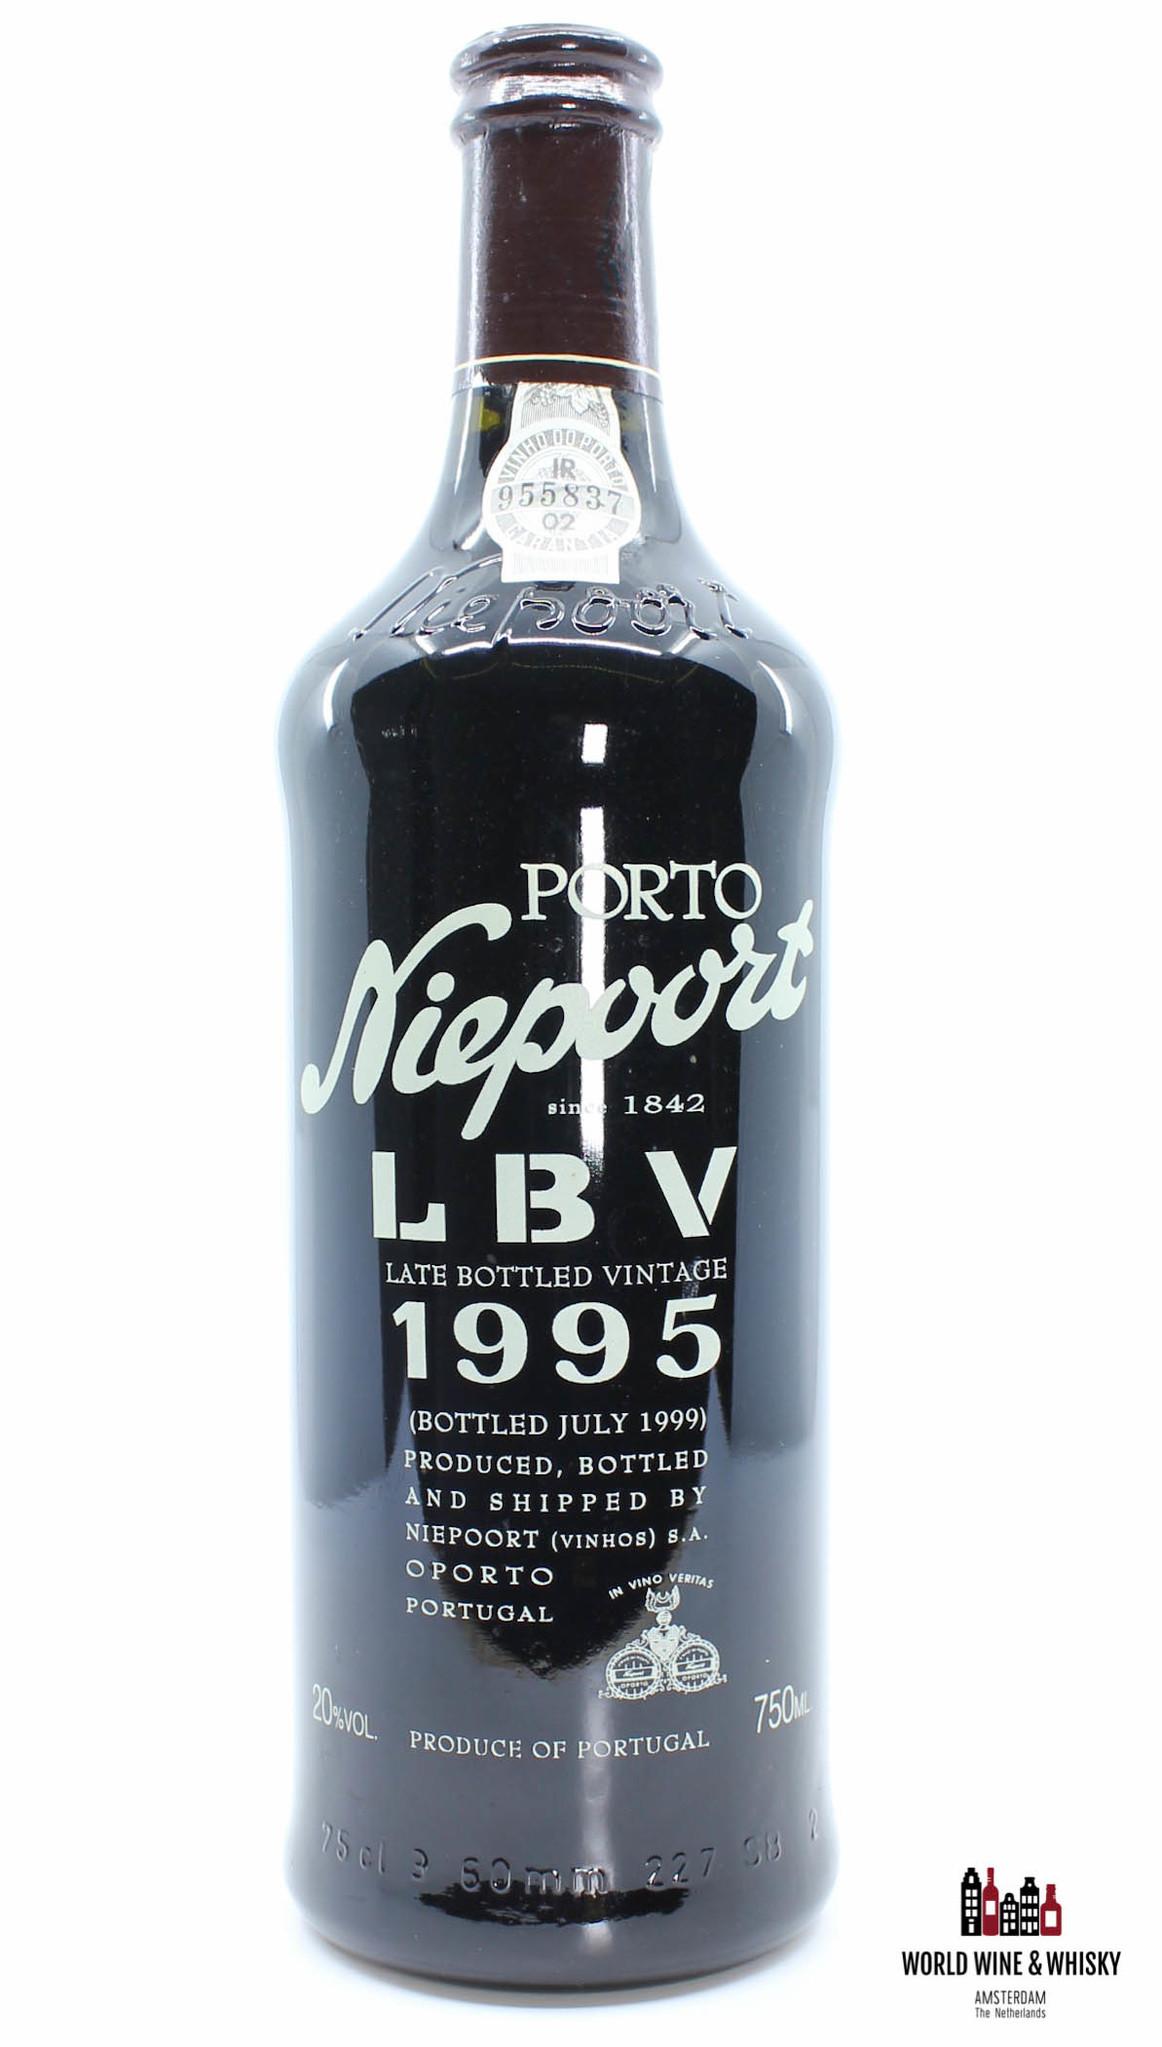 Niepoort Niepoort Porto LBV 1995 - bottled in 1999 - Late Bottled Vintage